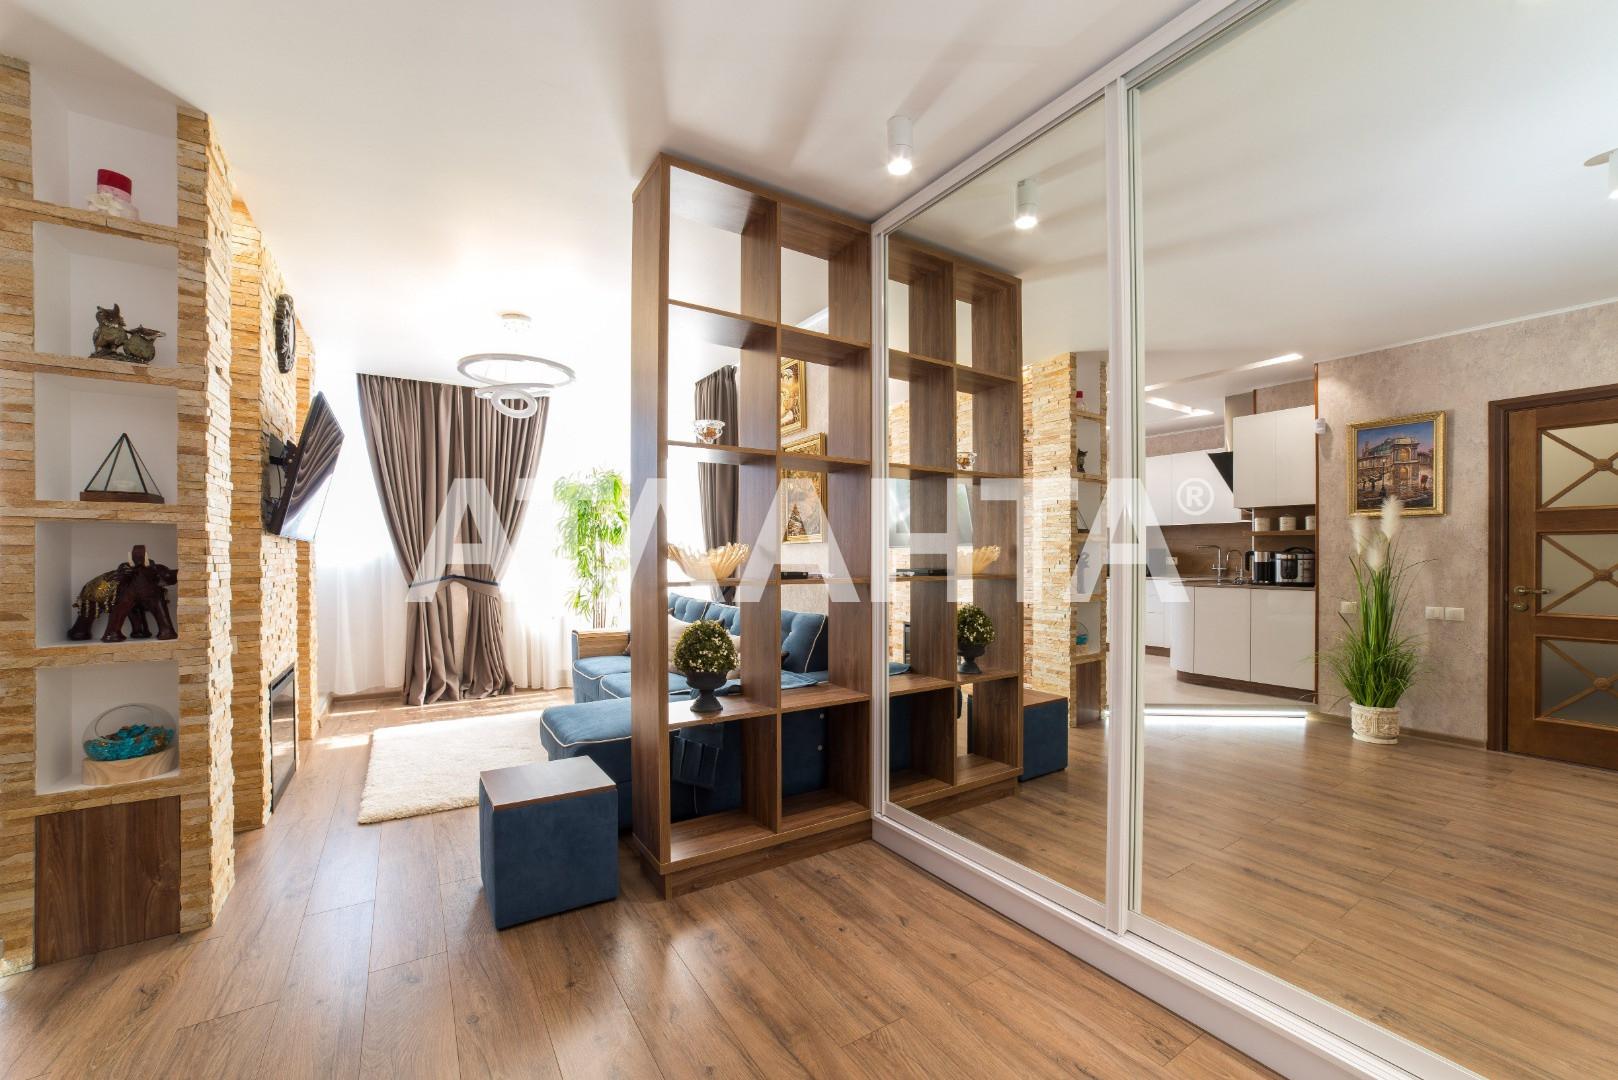 Продается 1-комнатная Квартира на ул. Балковская (Фрунзе) — 50 000 у.е. (фото №16)